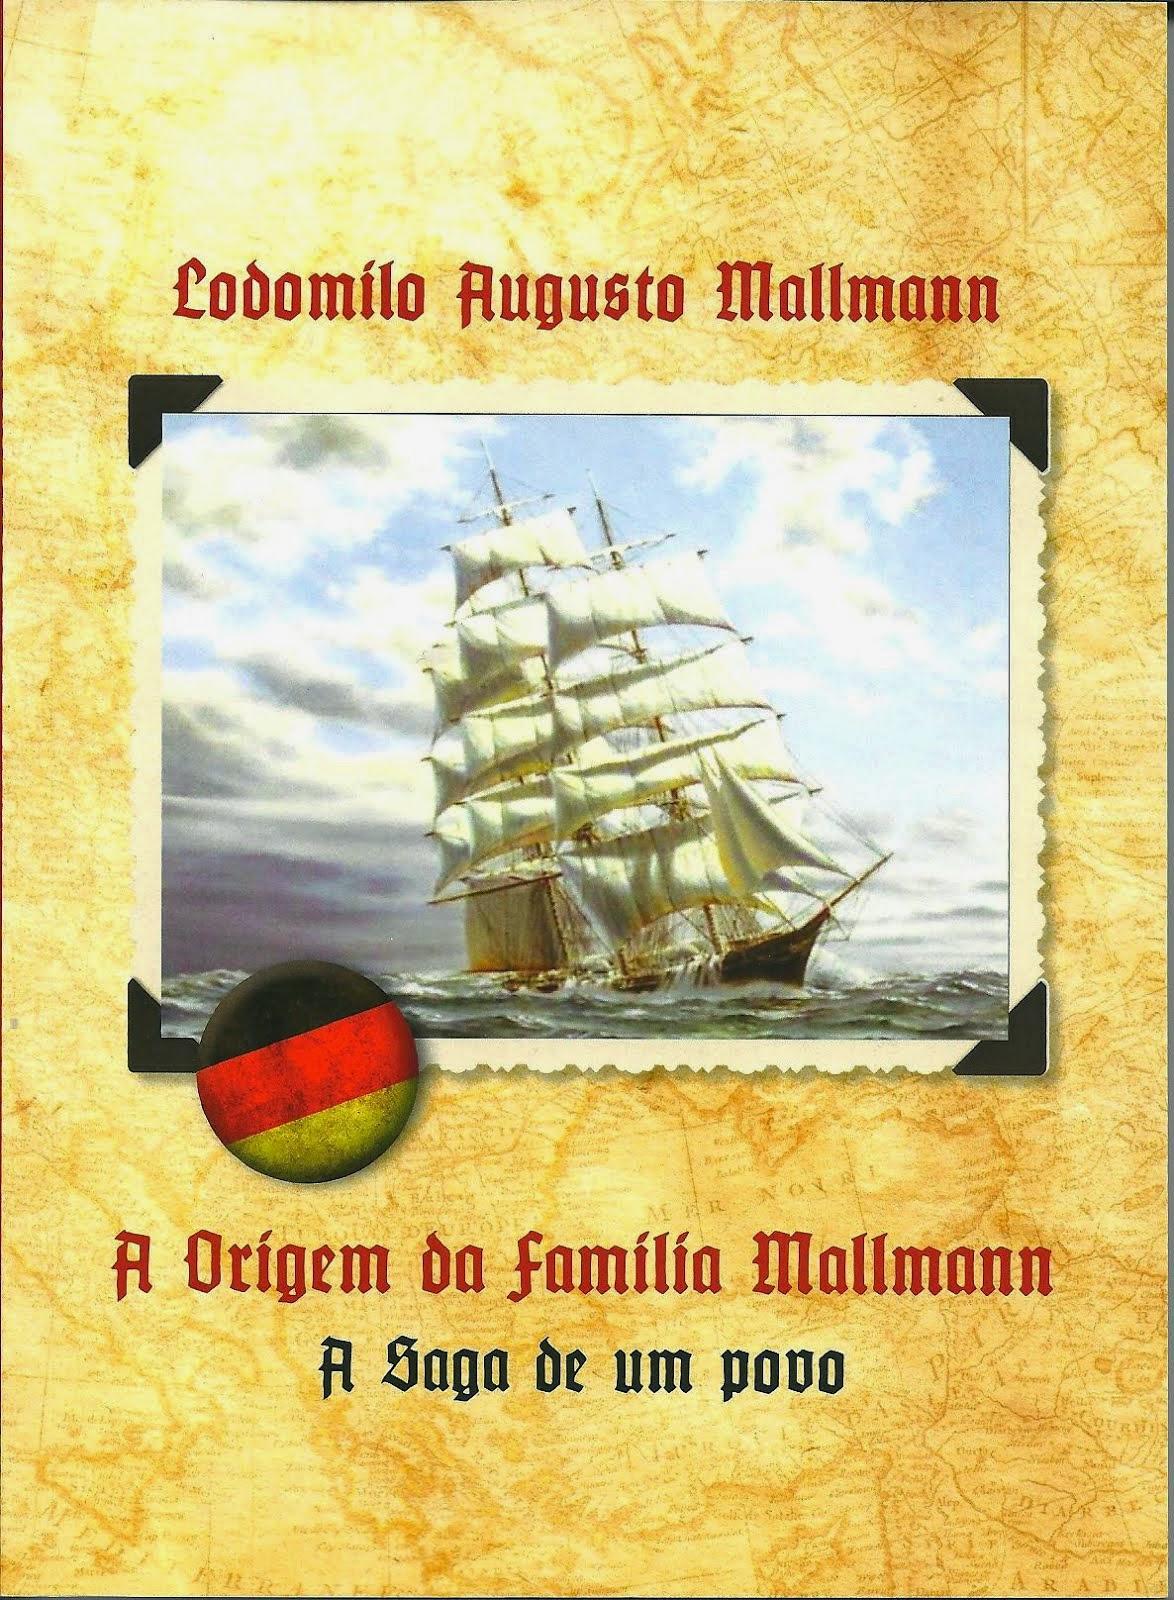 História da Família Mallmann